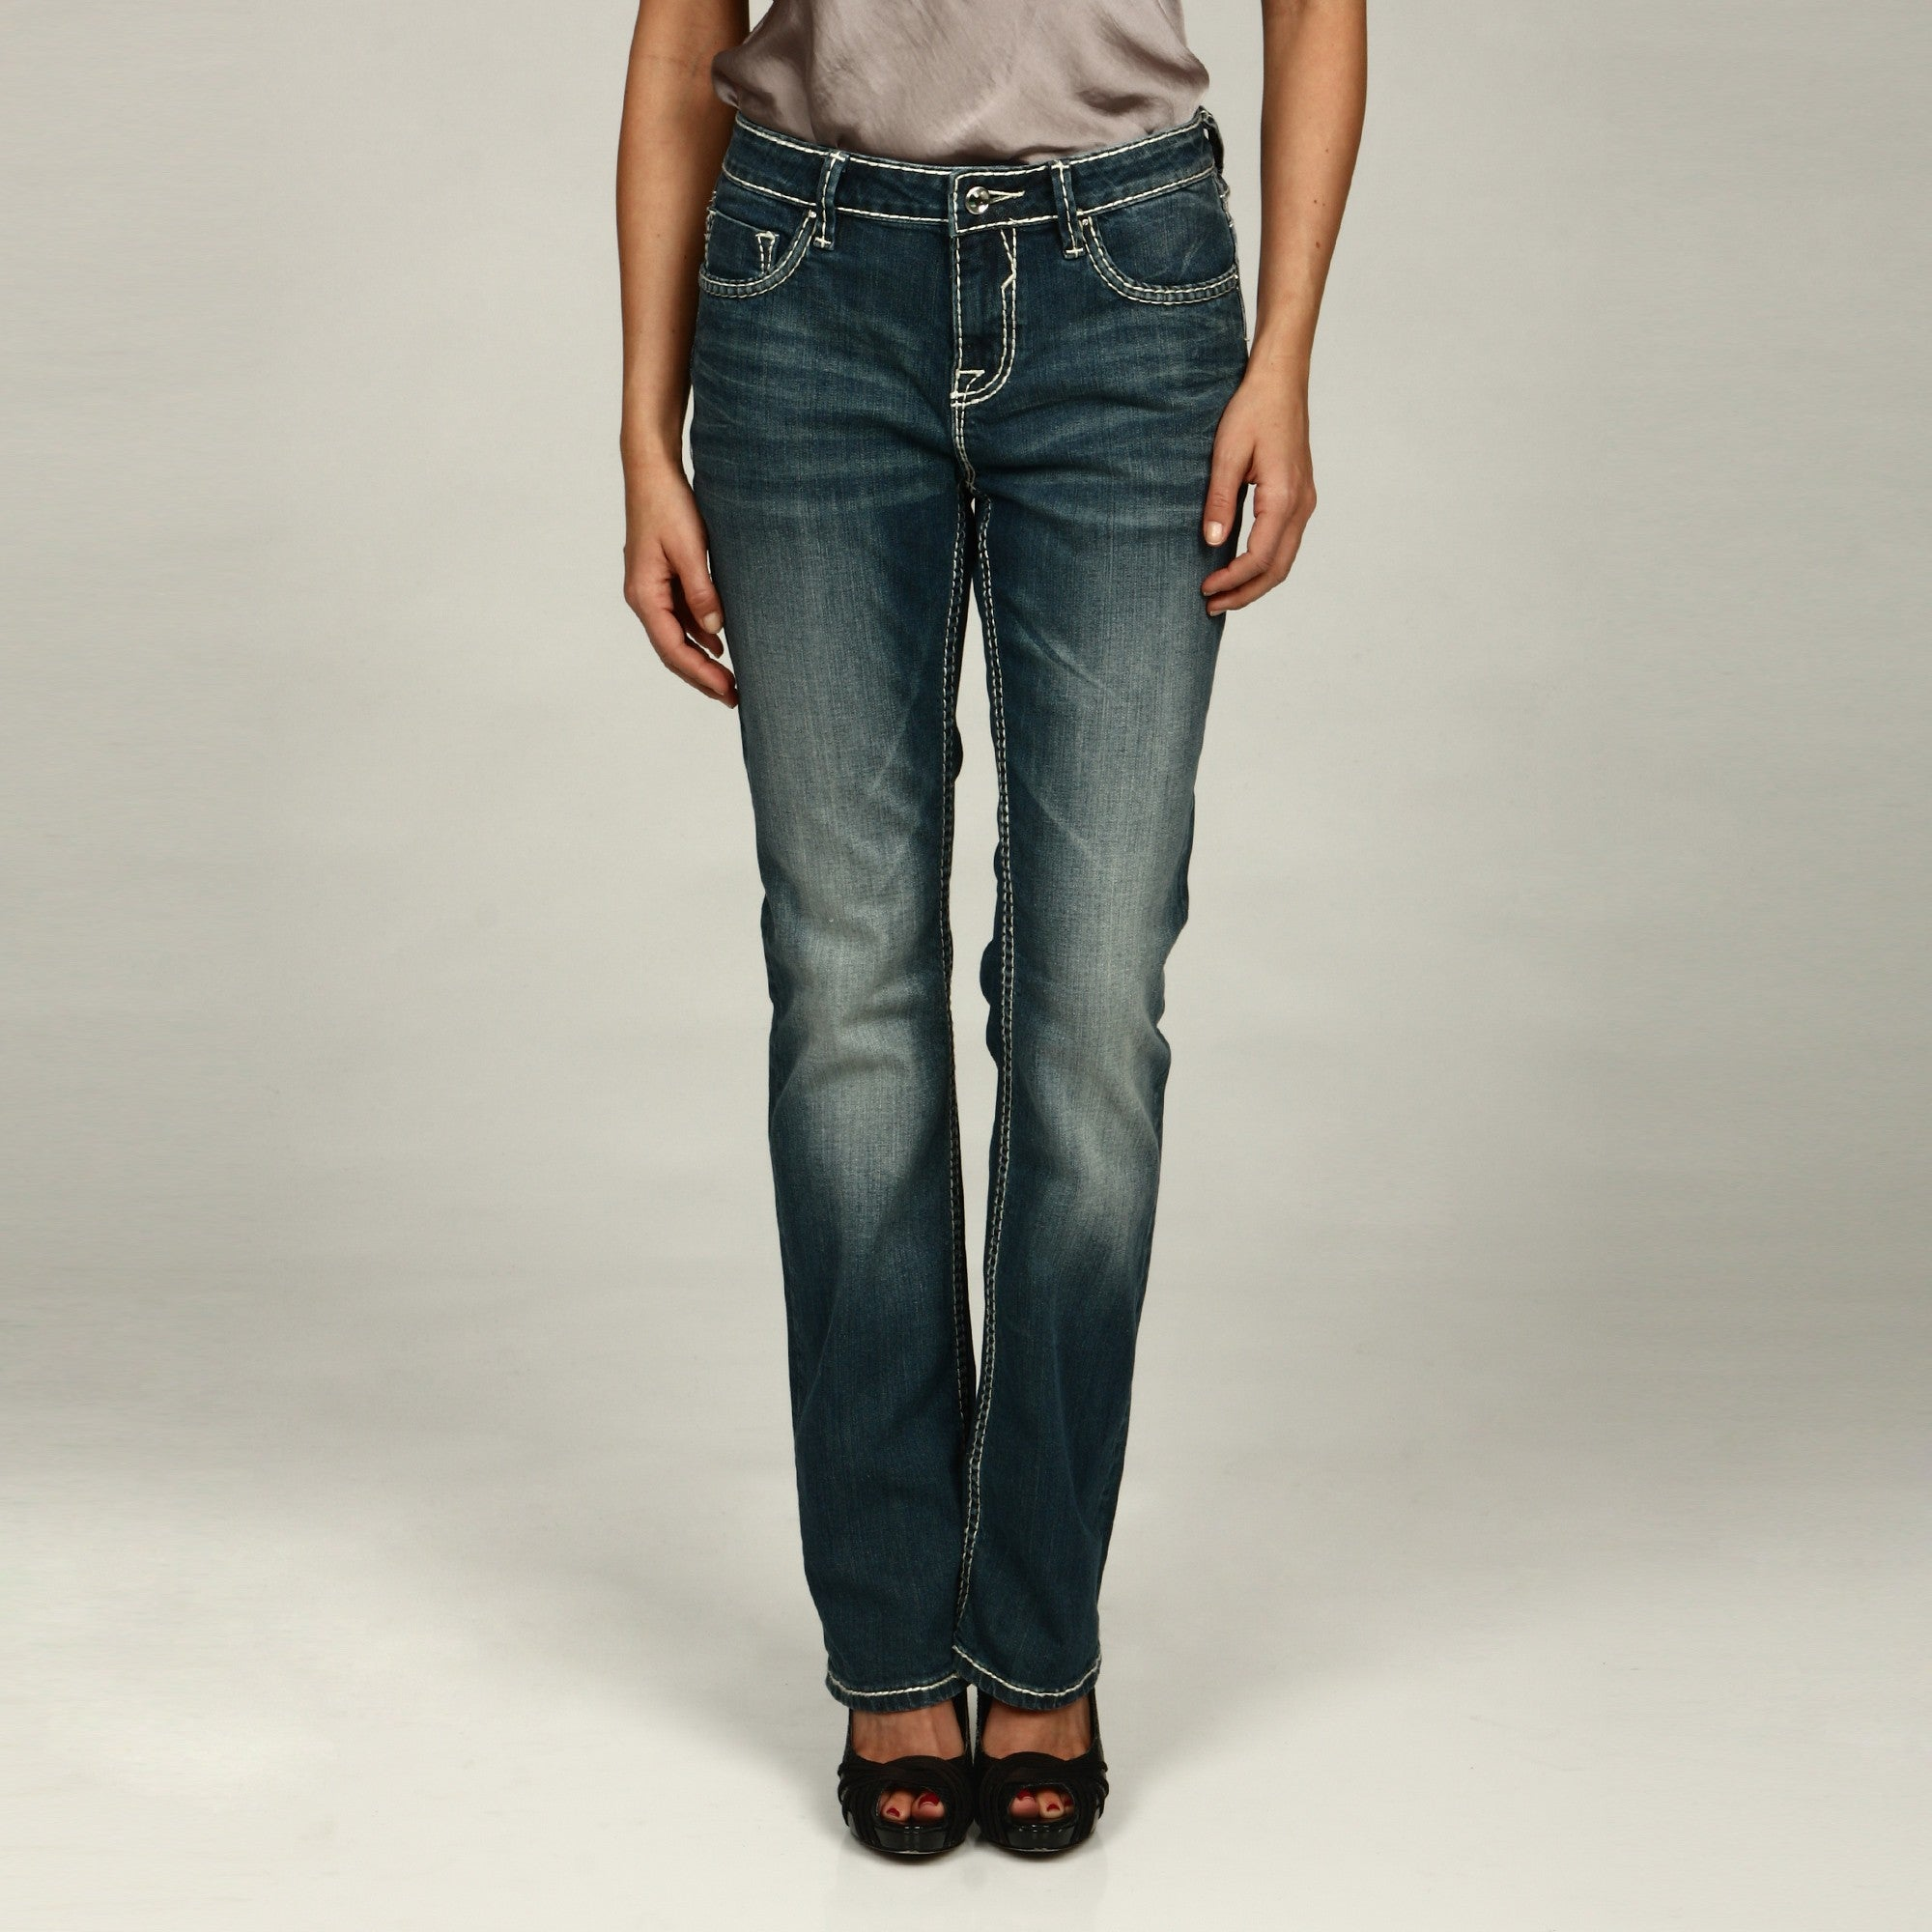 12526d8693f Shop Vigoss Women s Medium Wash Bootcut Embellished-pockets Jeans ...